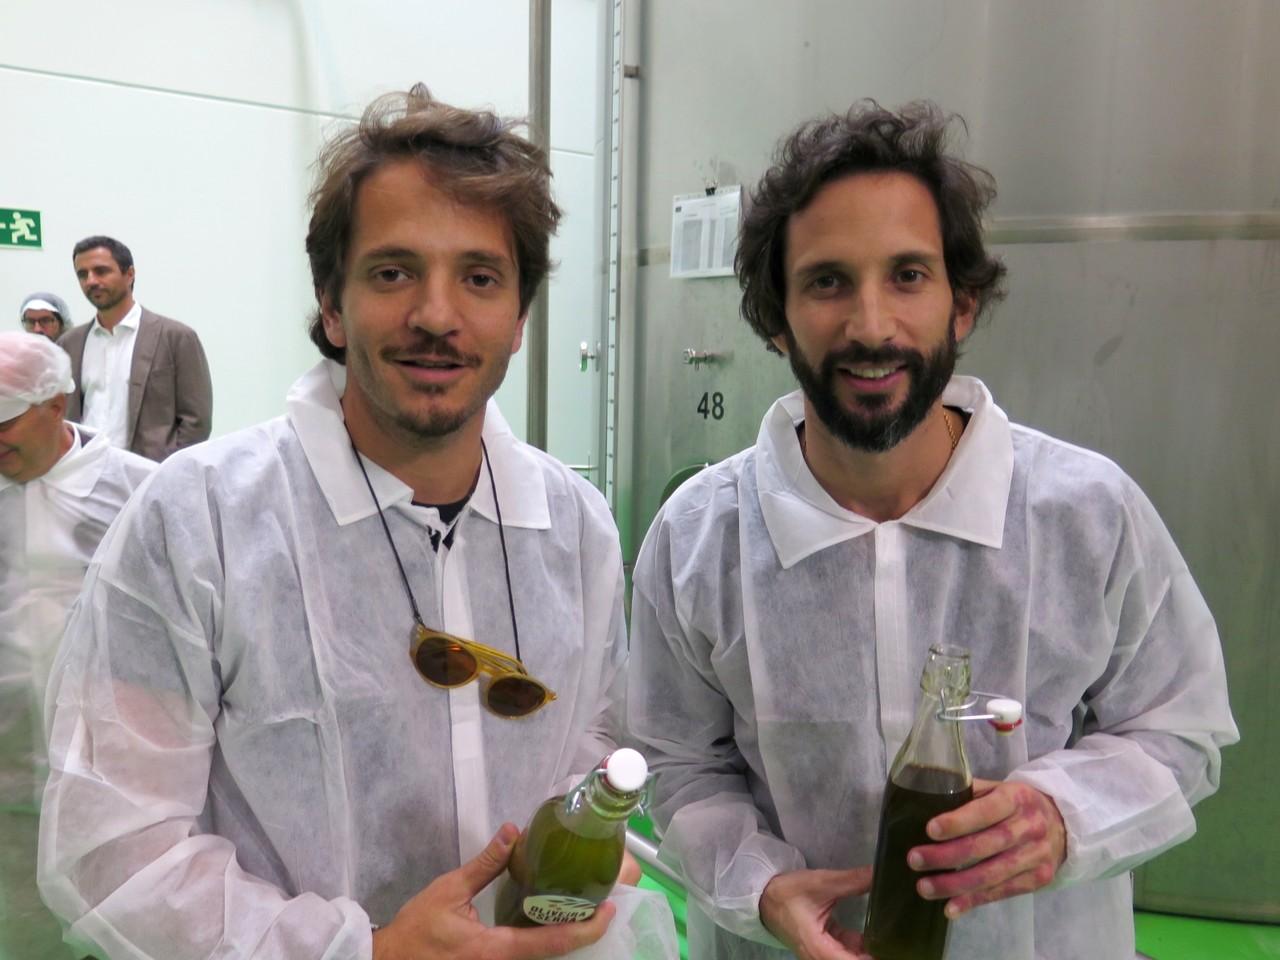 Kiko Martins e José Avillez